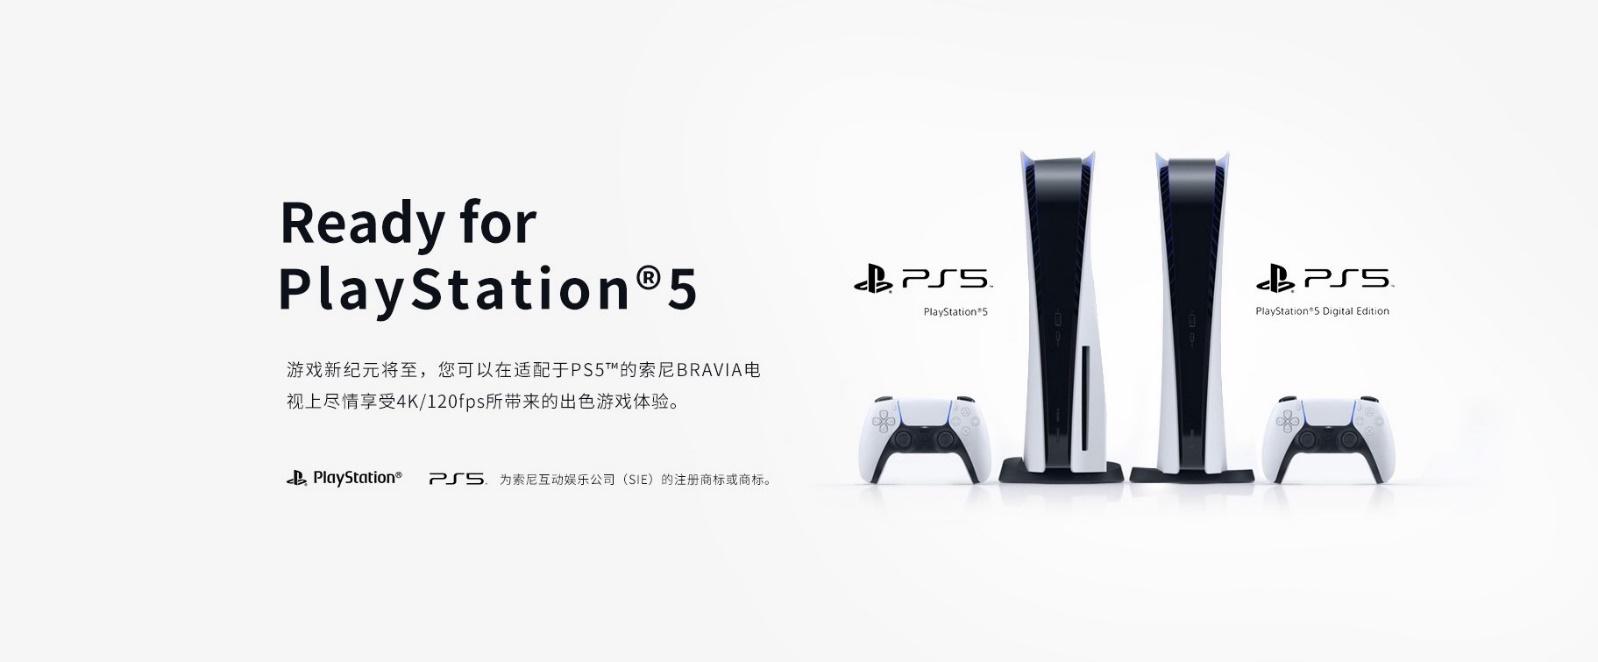 "索尼公布""Ready for PlayStation®5""BRAVIATM电视阵容-视听圈"